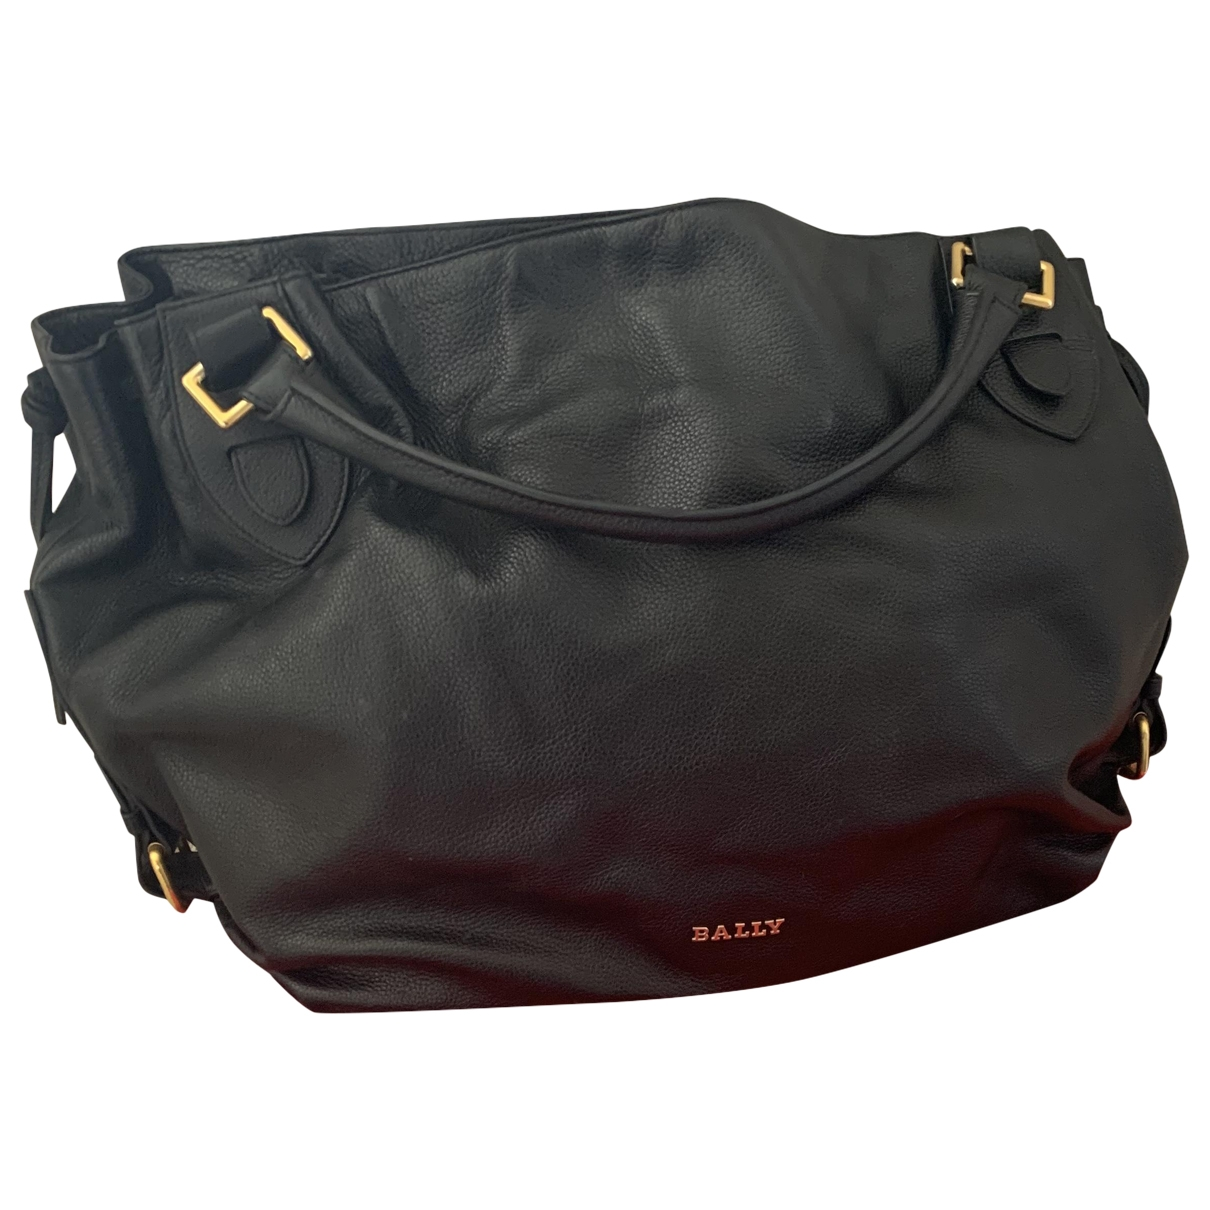 Bally - Sac a main   pour femme en cuir - noir